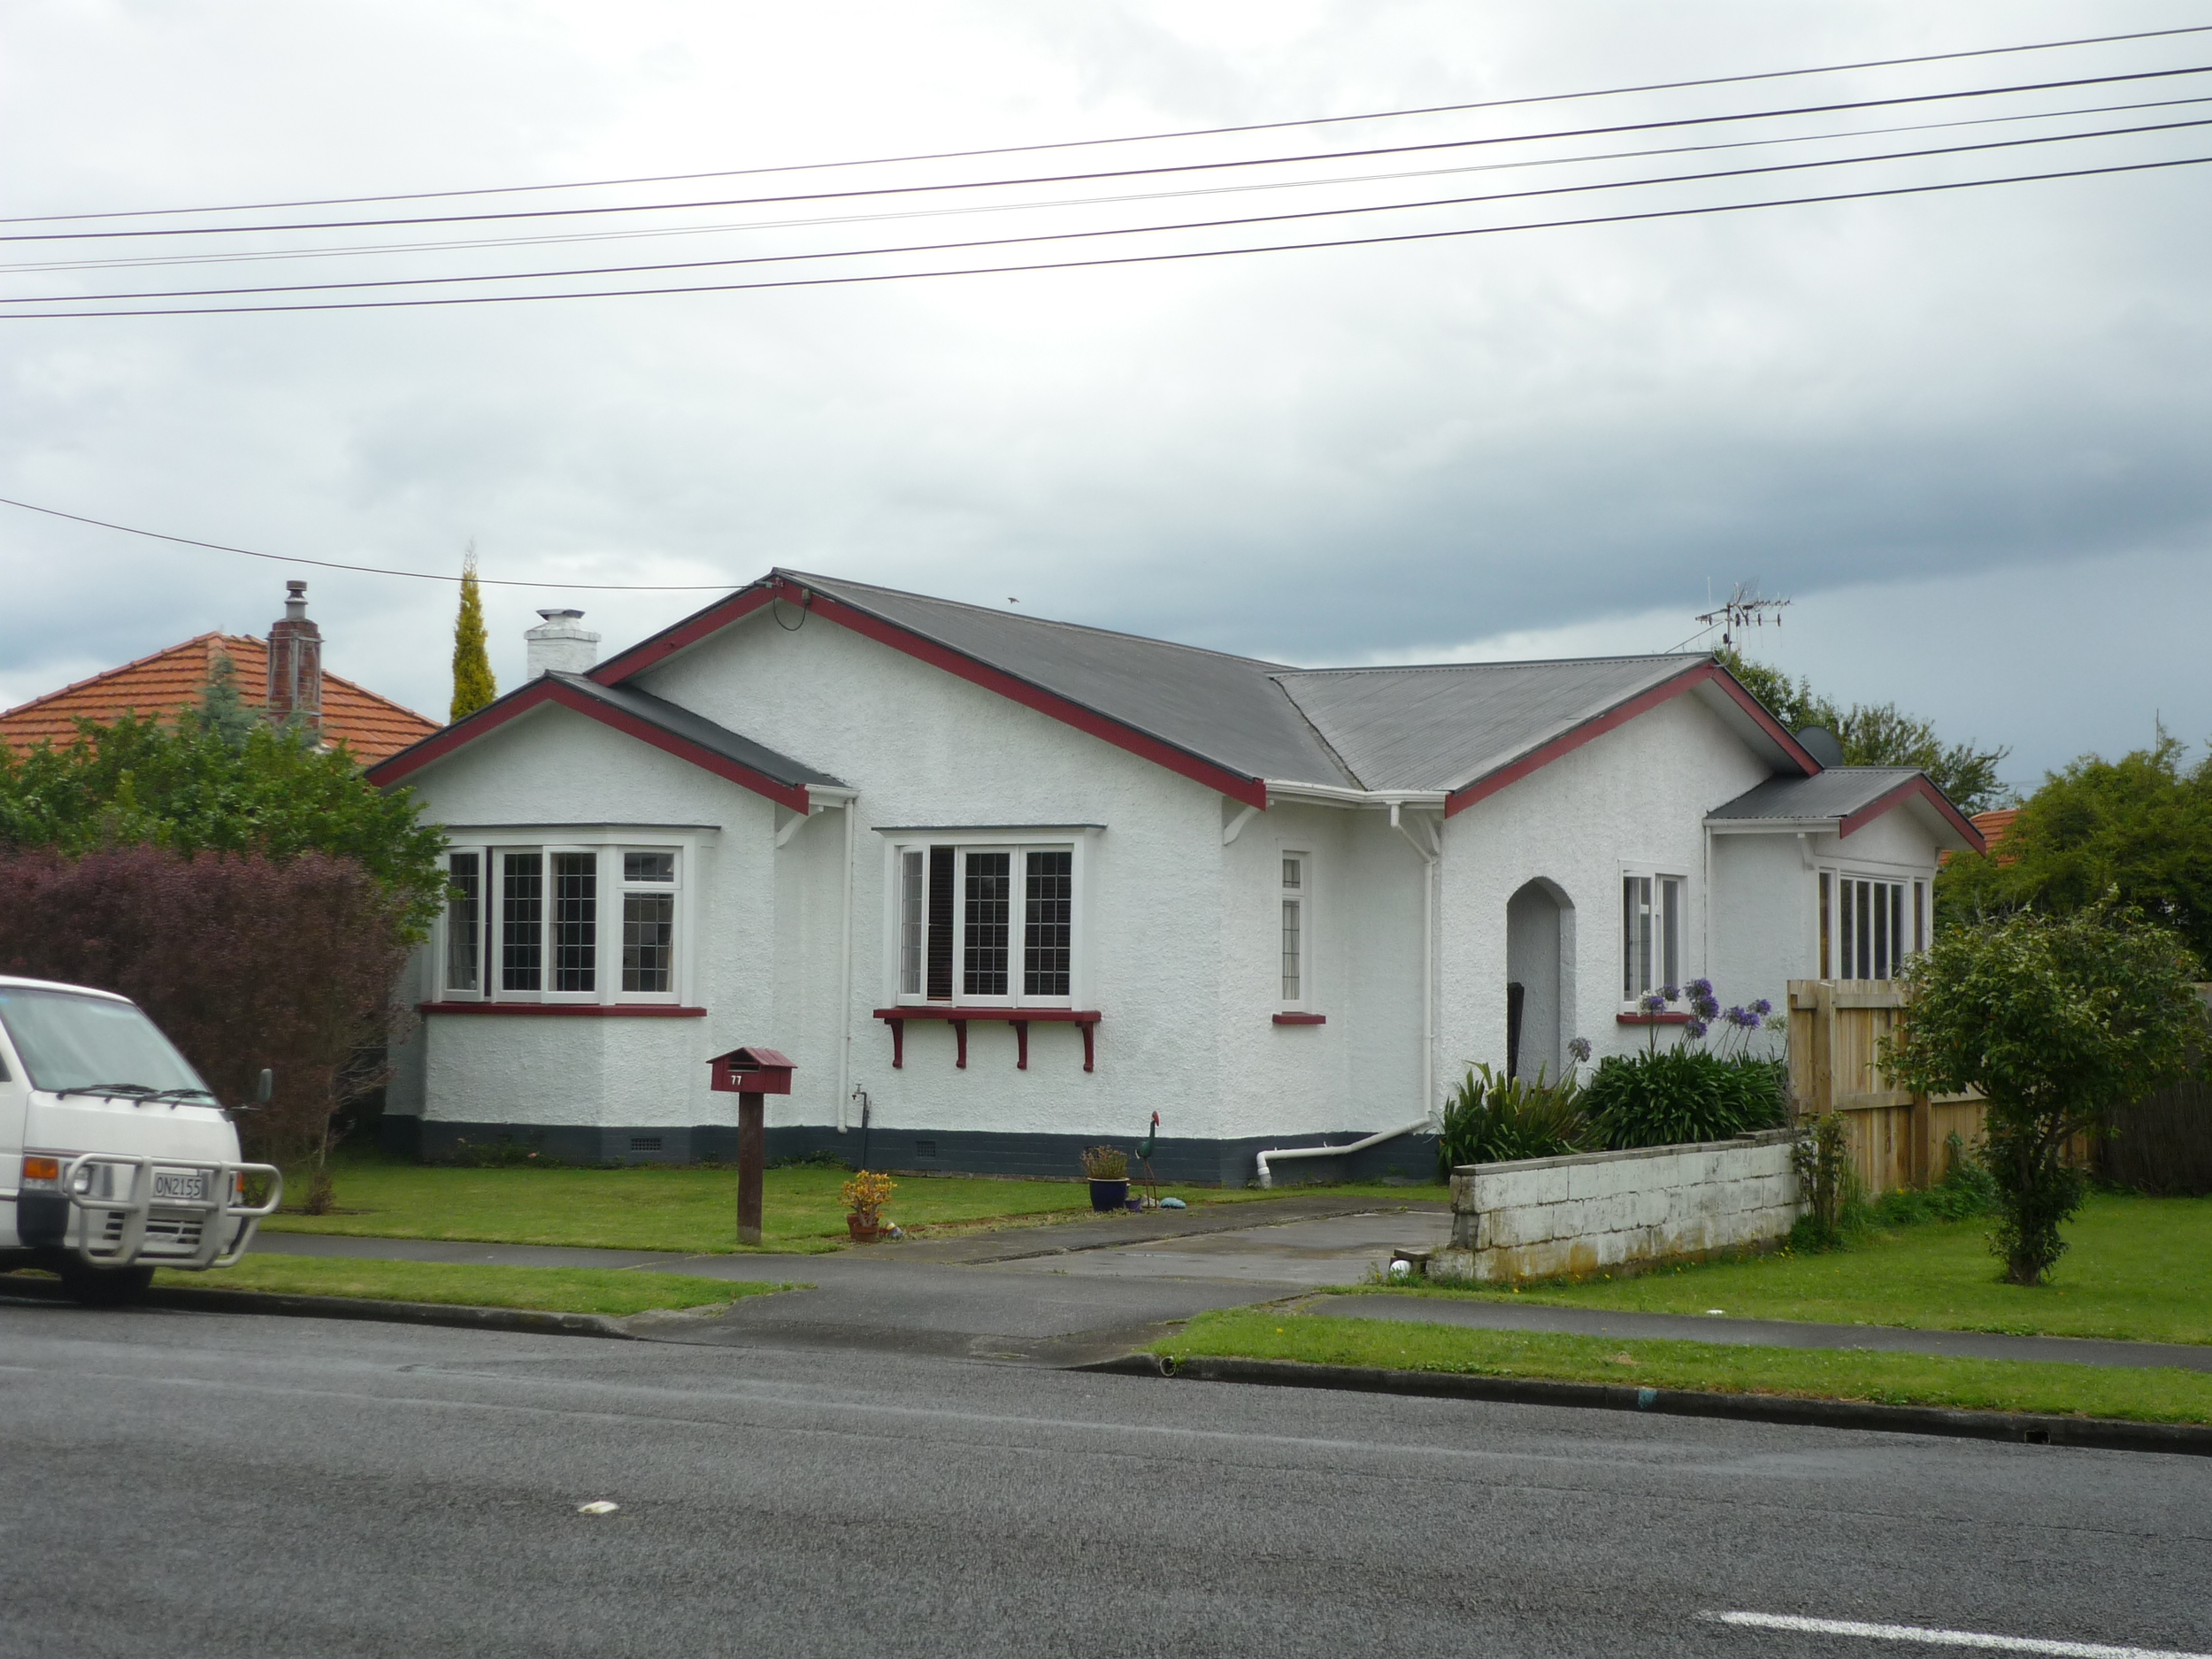 77 Nixon Street, Wanganui, New Zealand